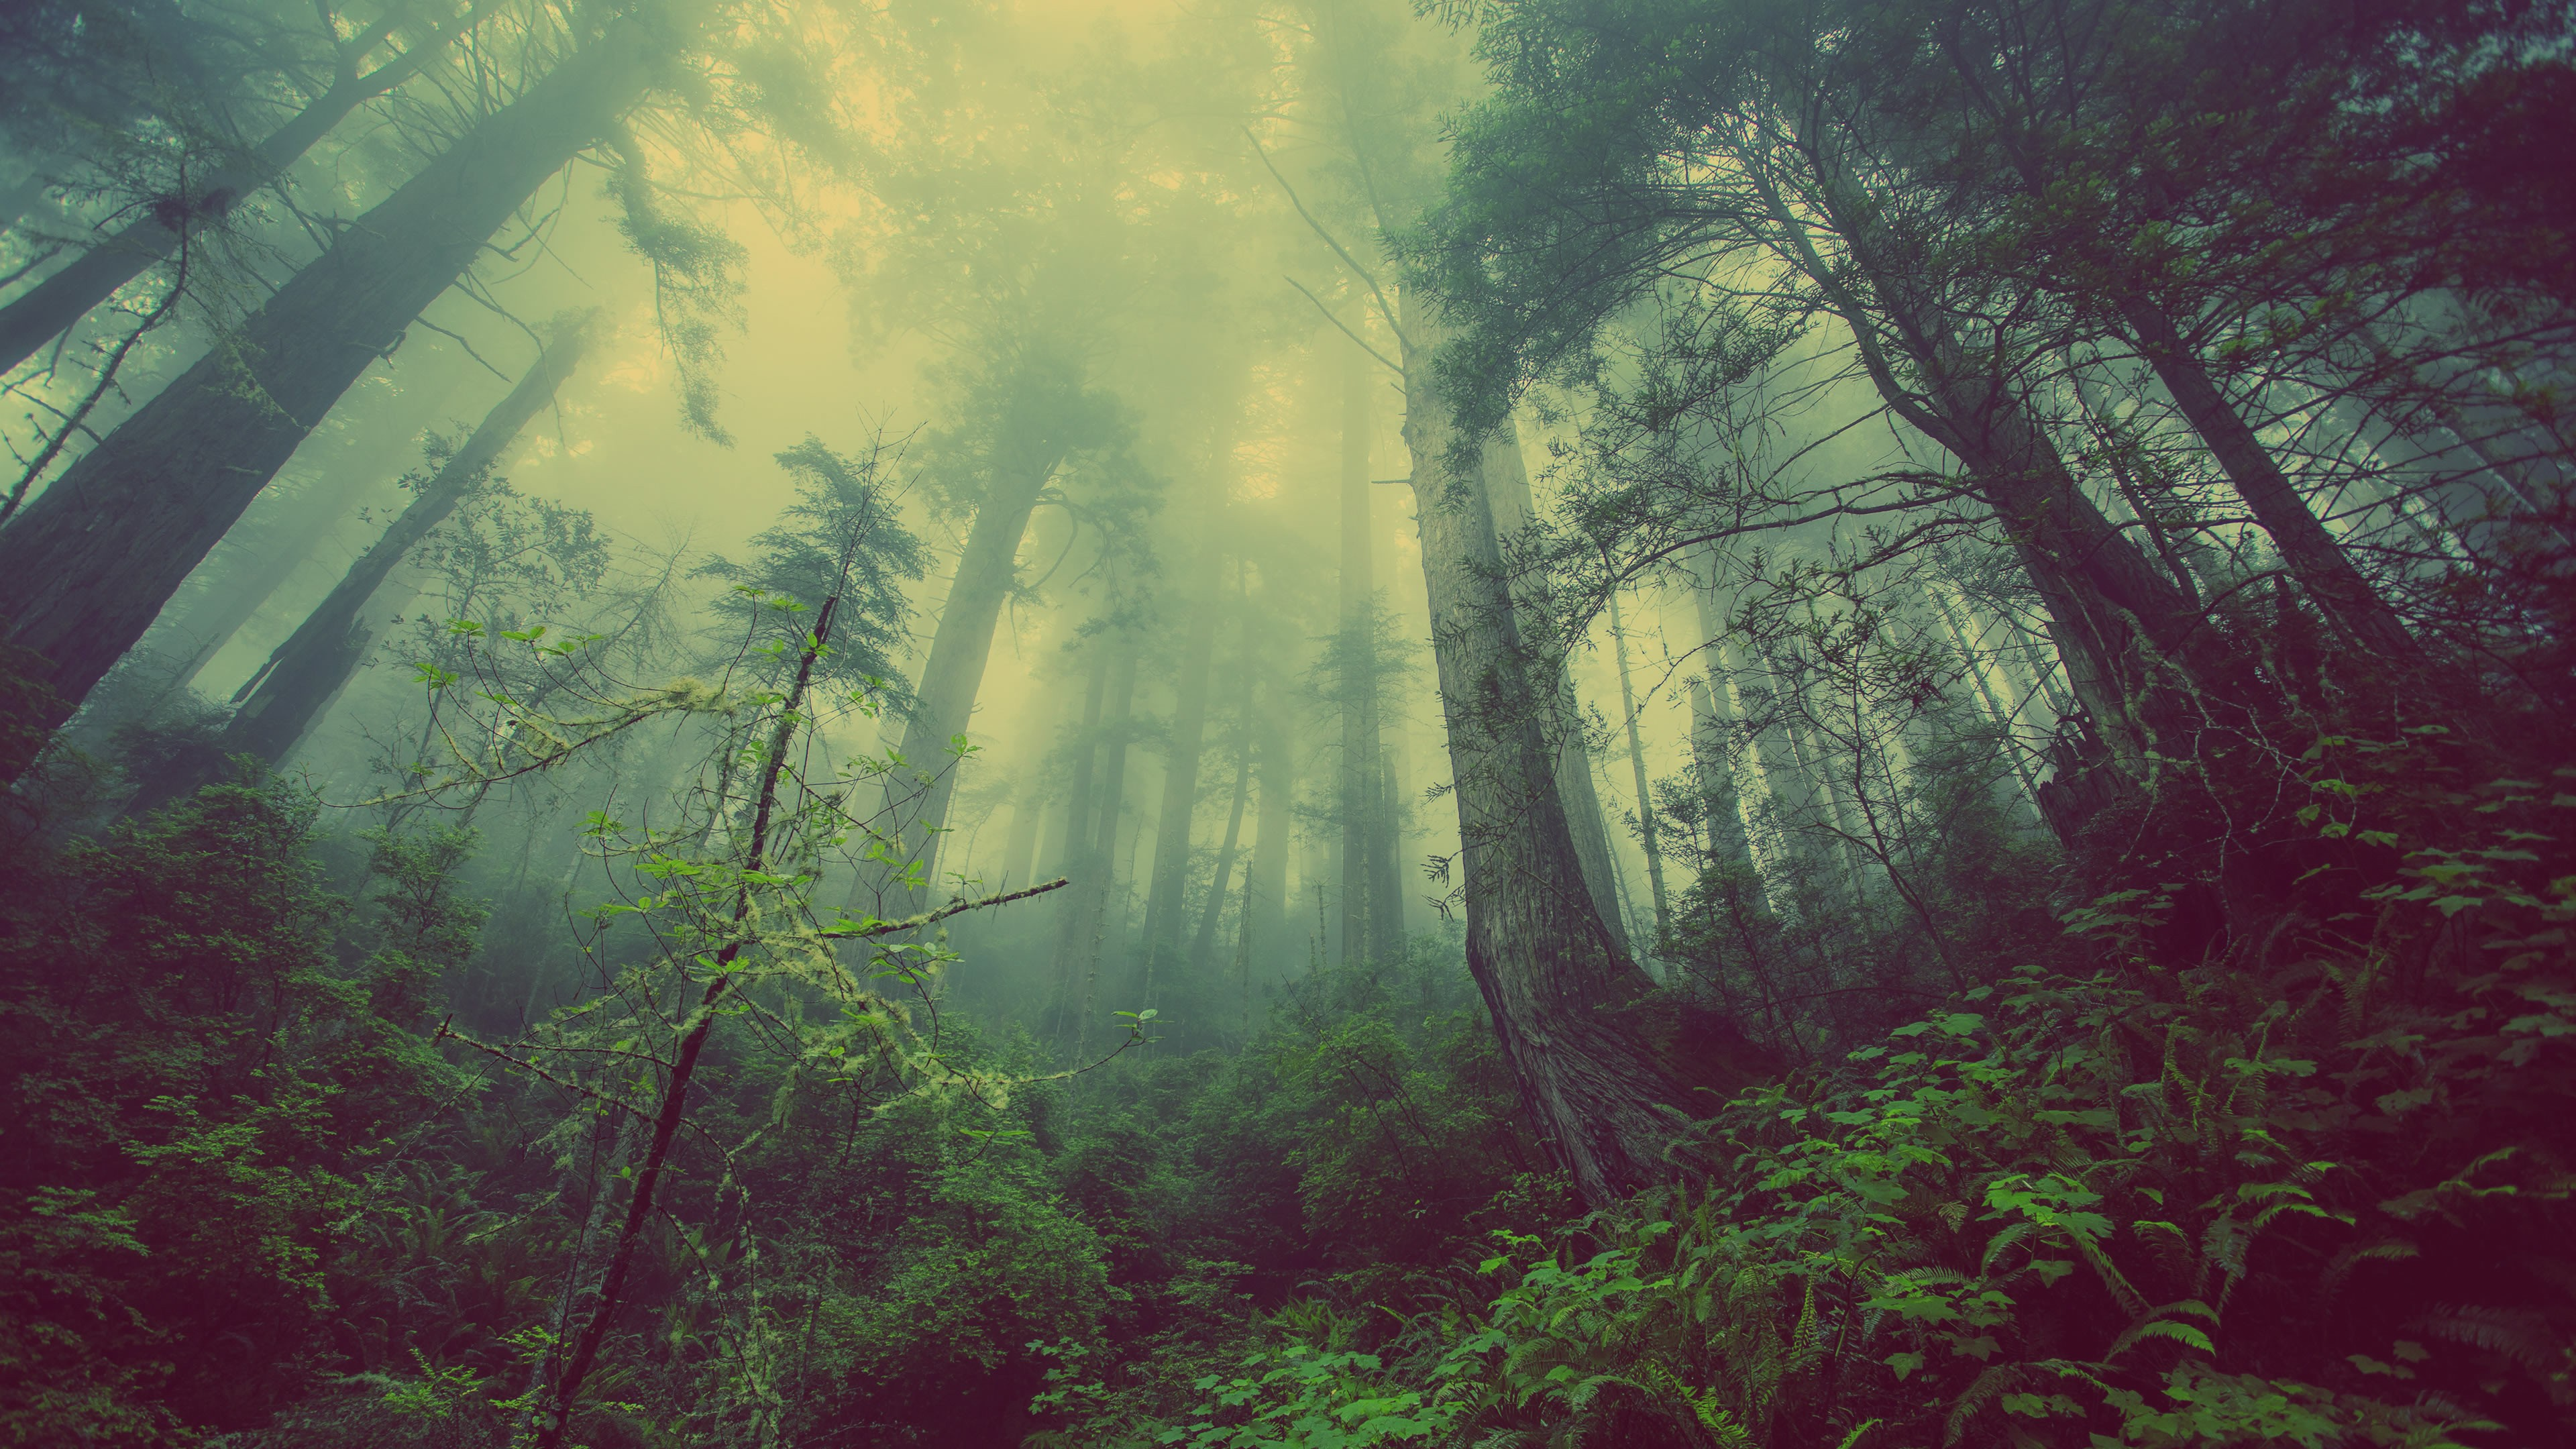 Wallpaper forest 4k 5k wallpaper green fog threes Nature 8160